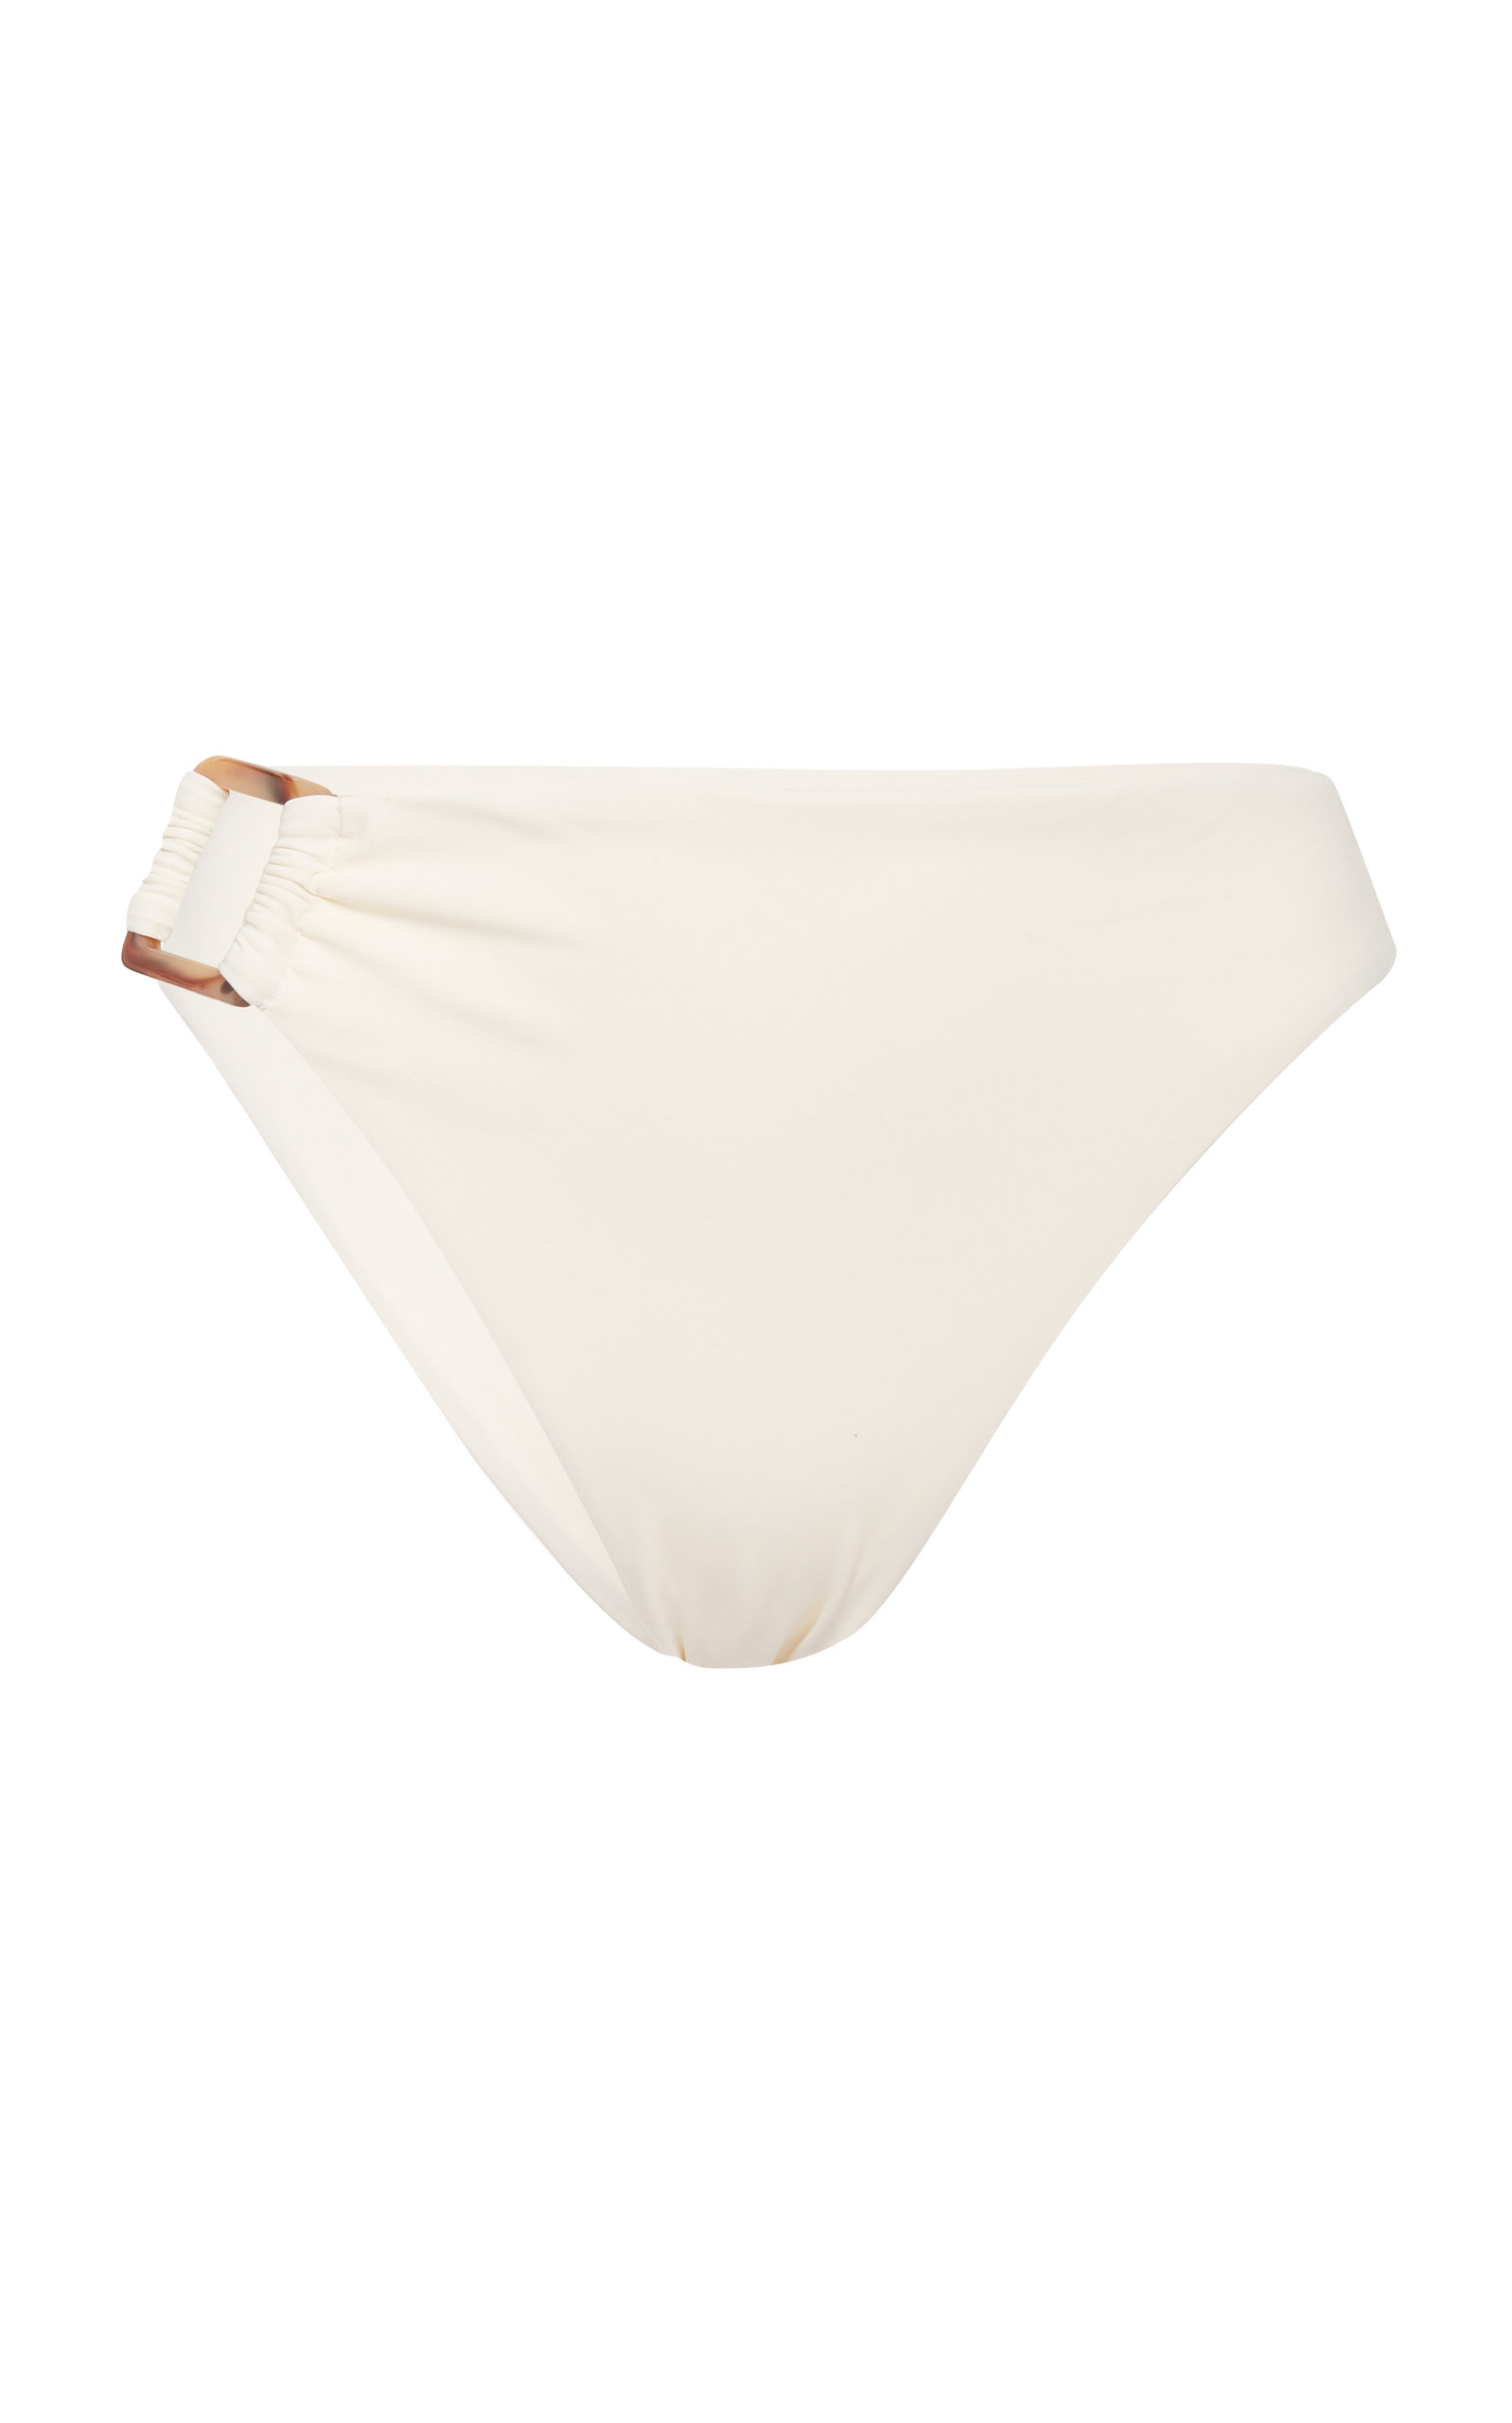 Women's Tortoiseshell-Detailed High-Rise Bikini Bottom